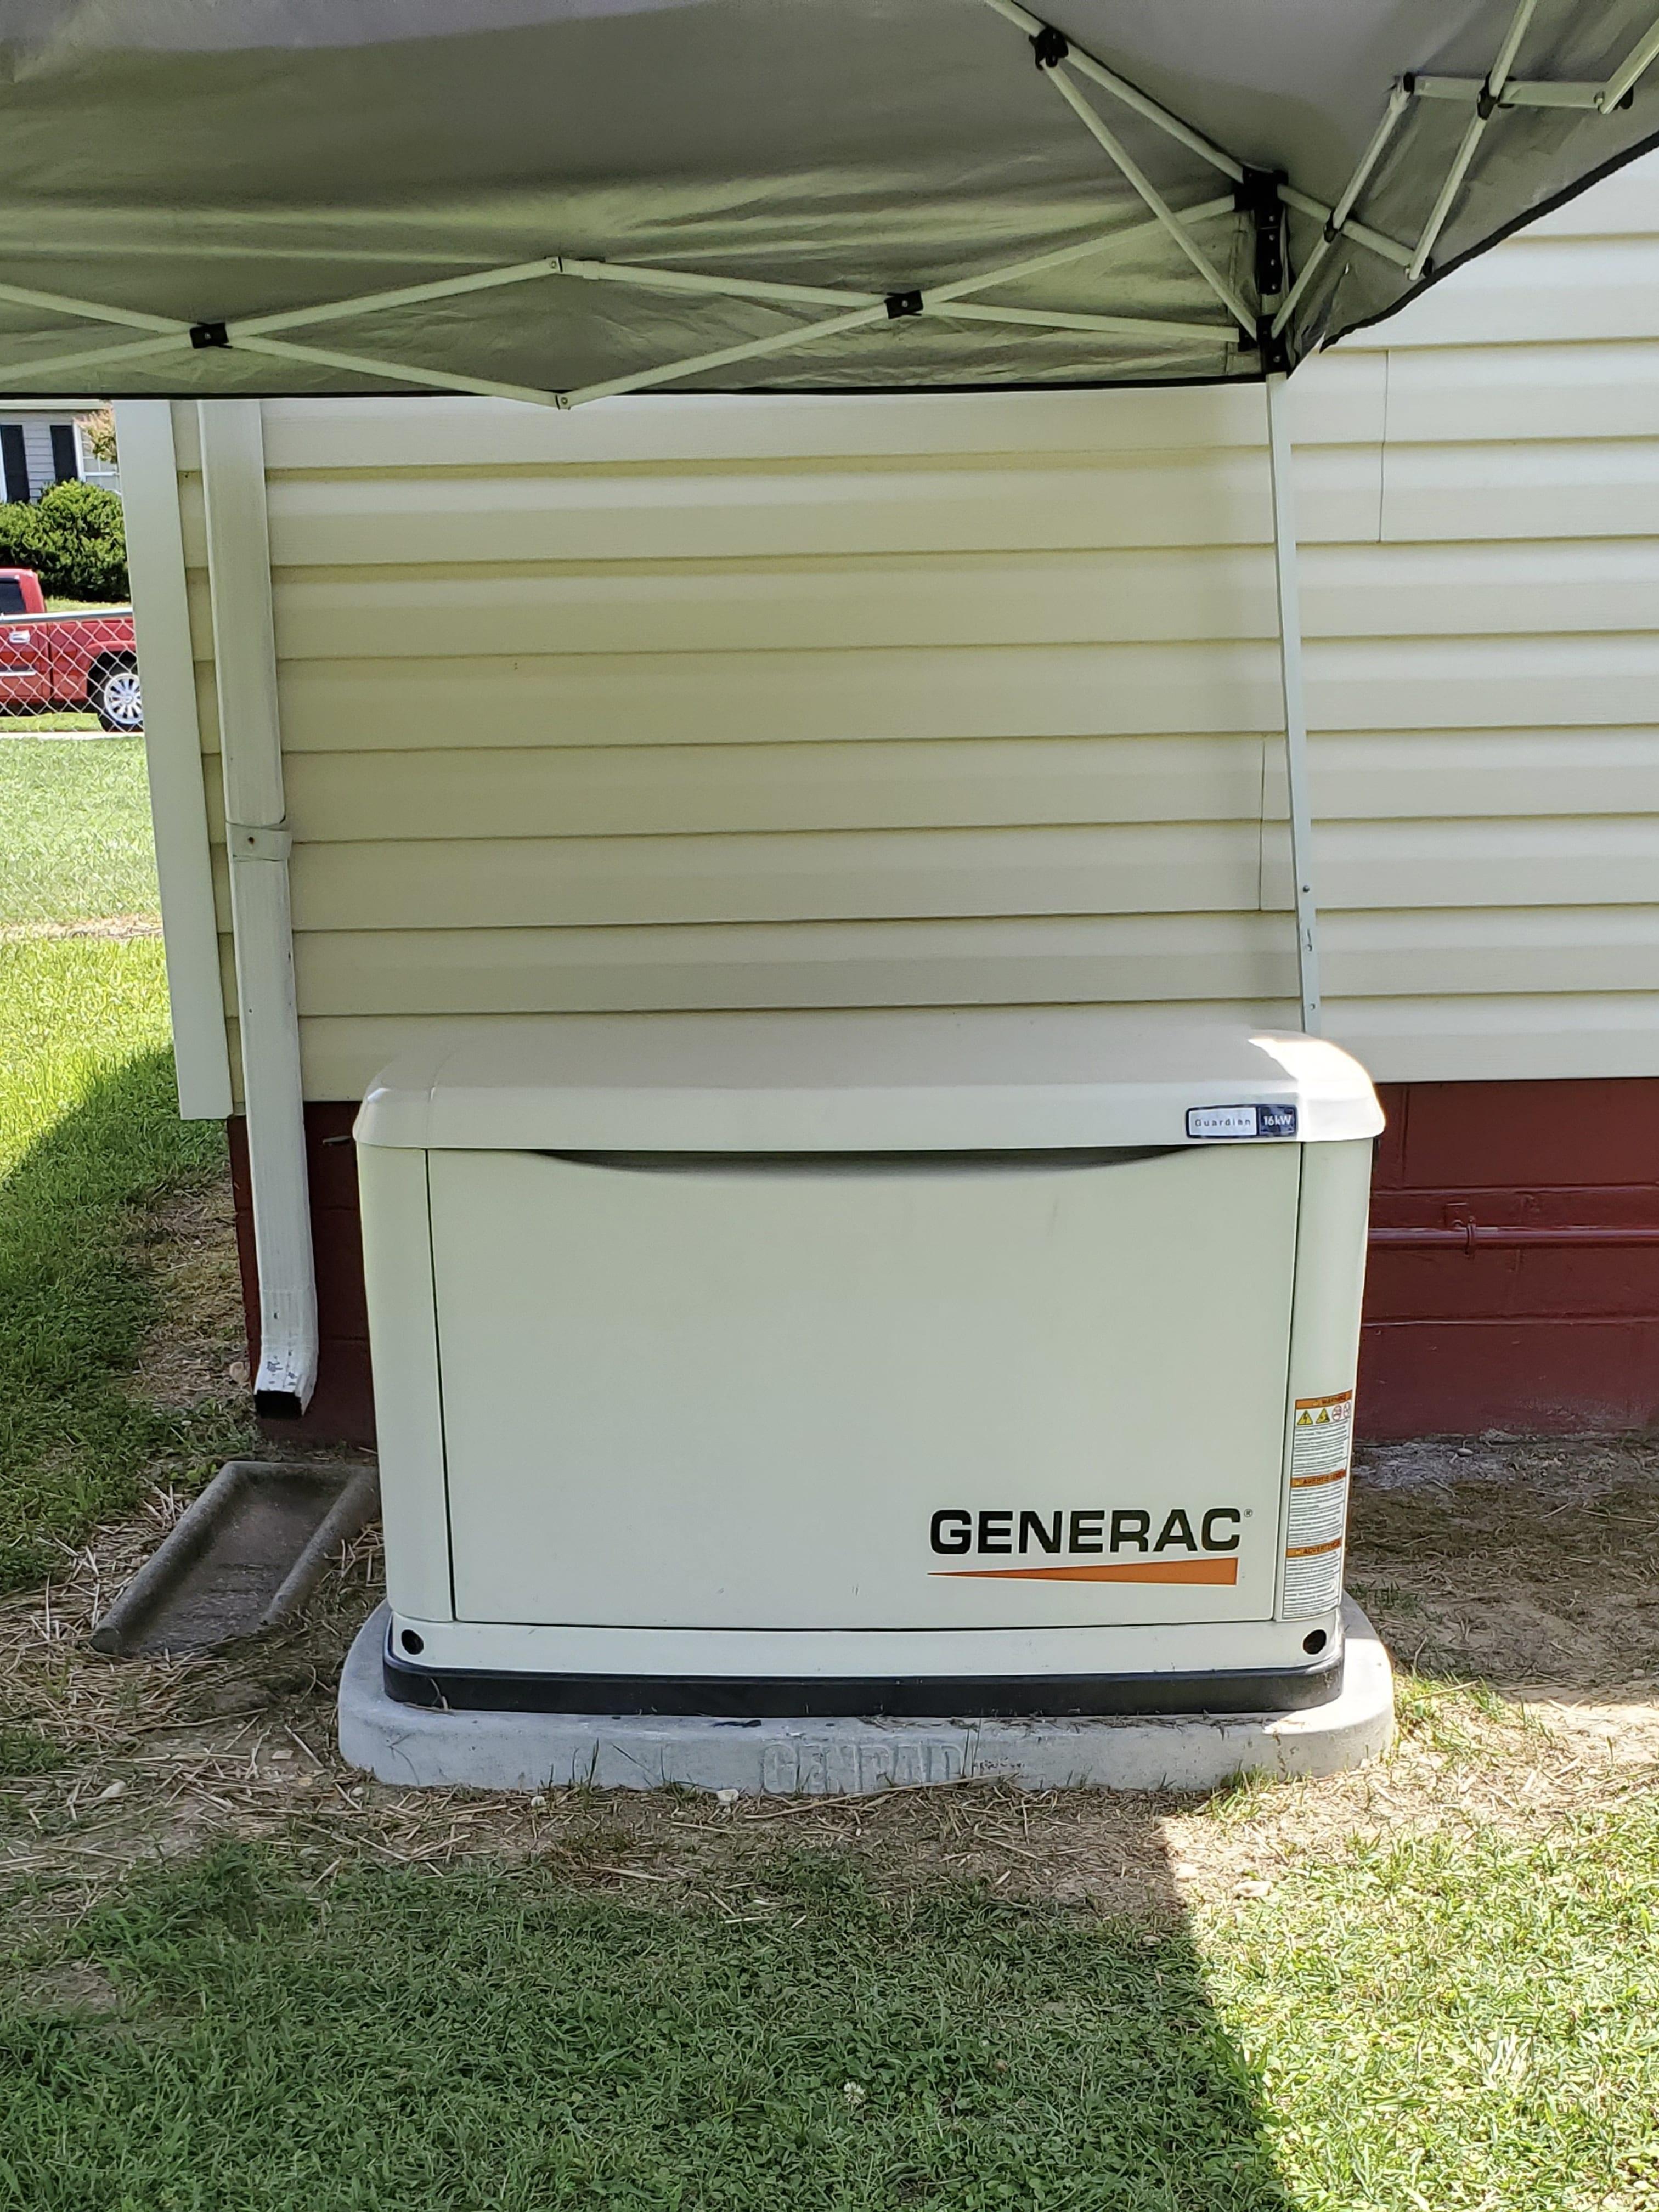 7.1.19 Petersburg Generac Automatic Standby Generator